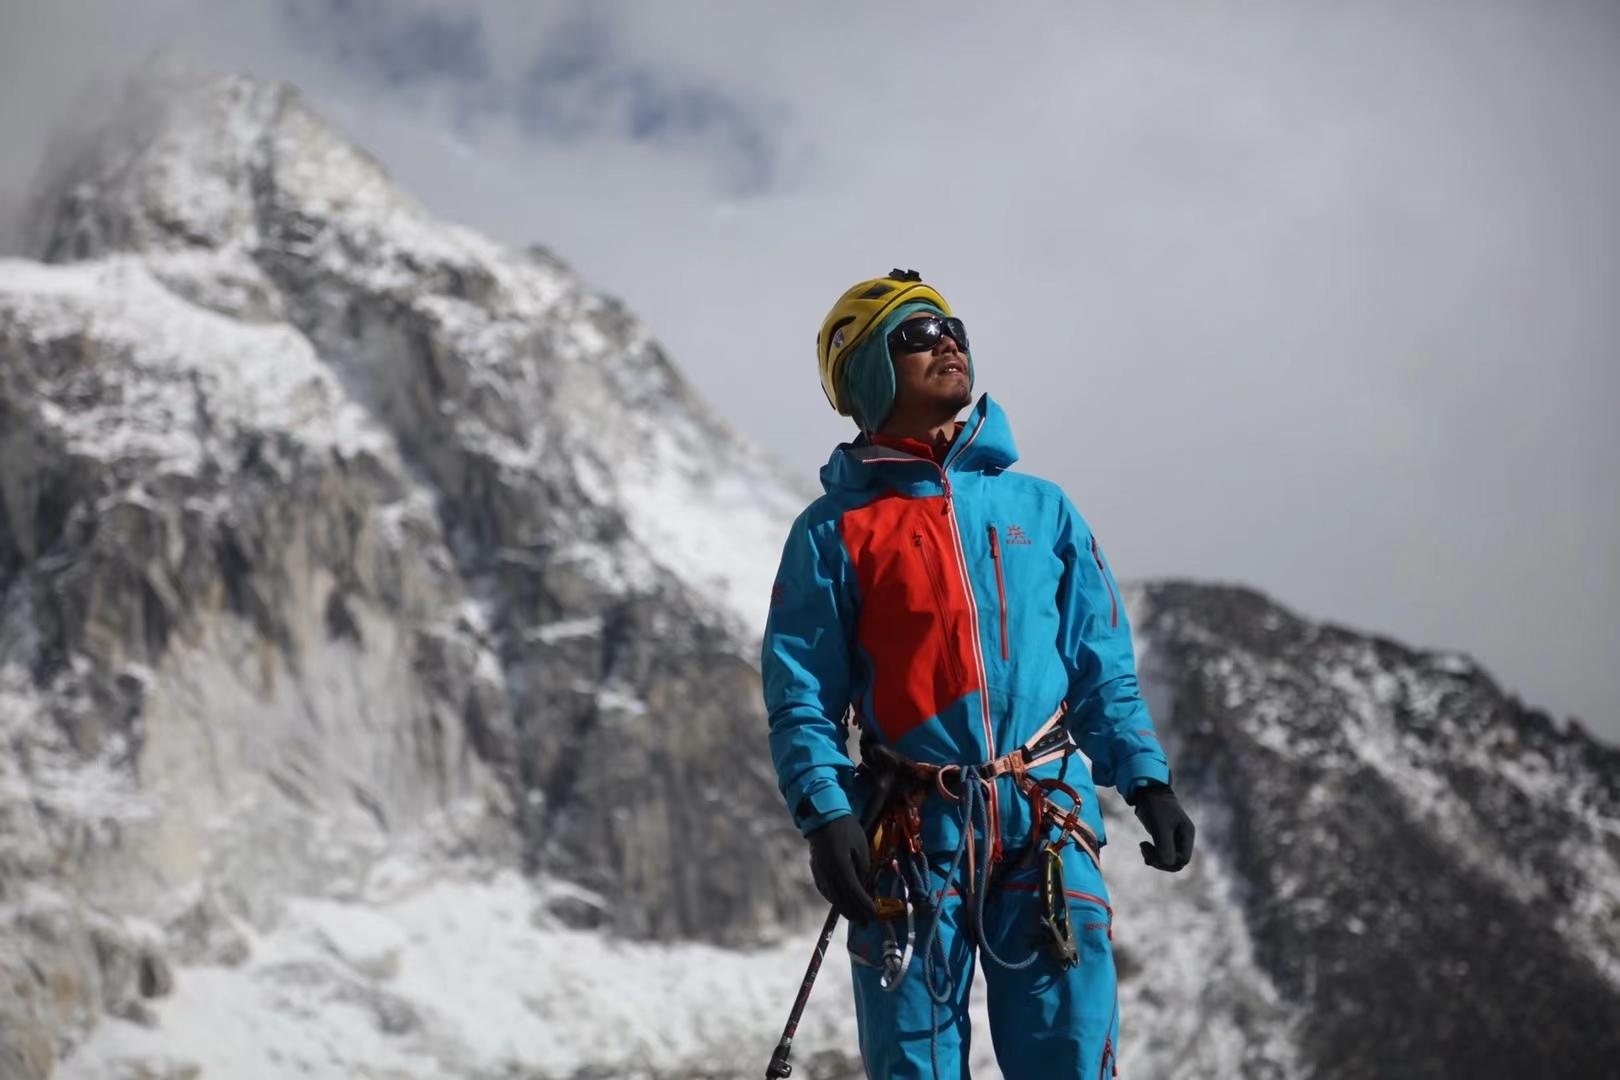 Zhang Hong a devenit al treilea alpinist nevăzător care a cucerit vârful Everest. VIDEO